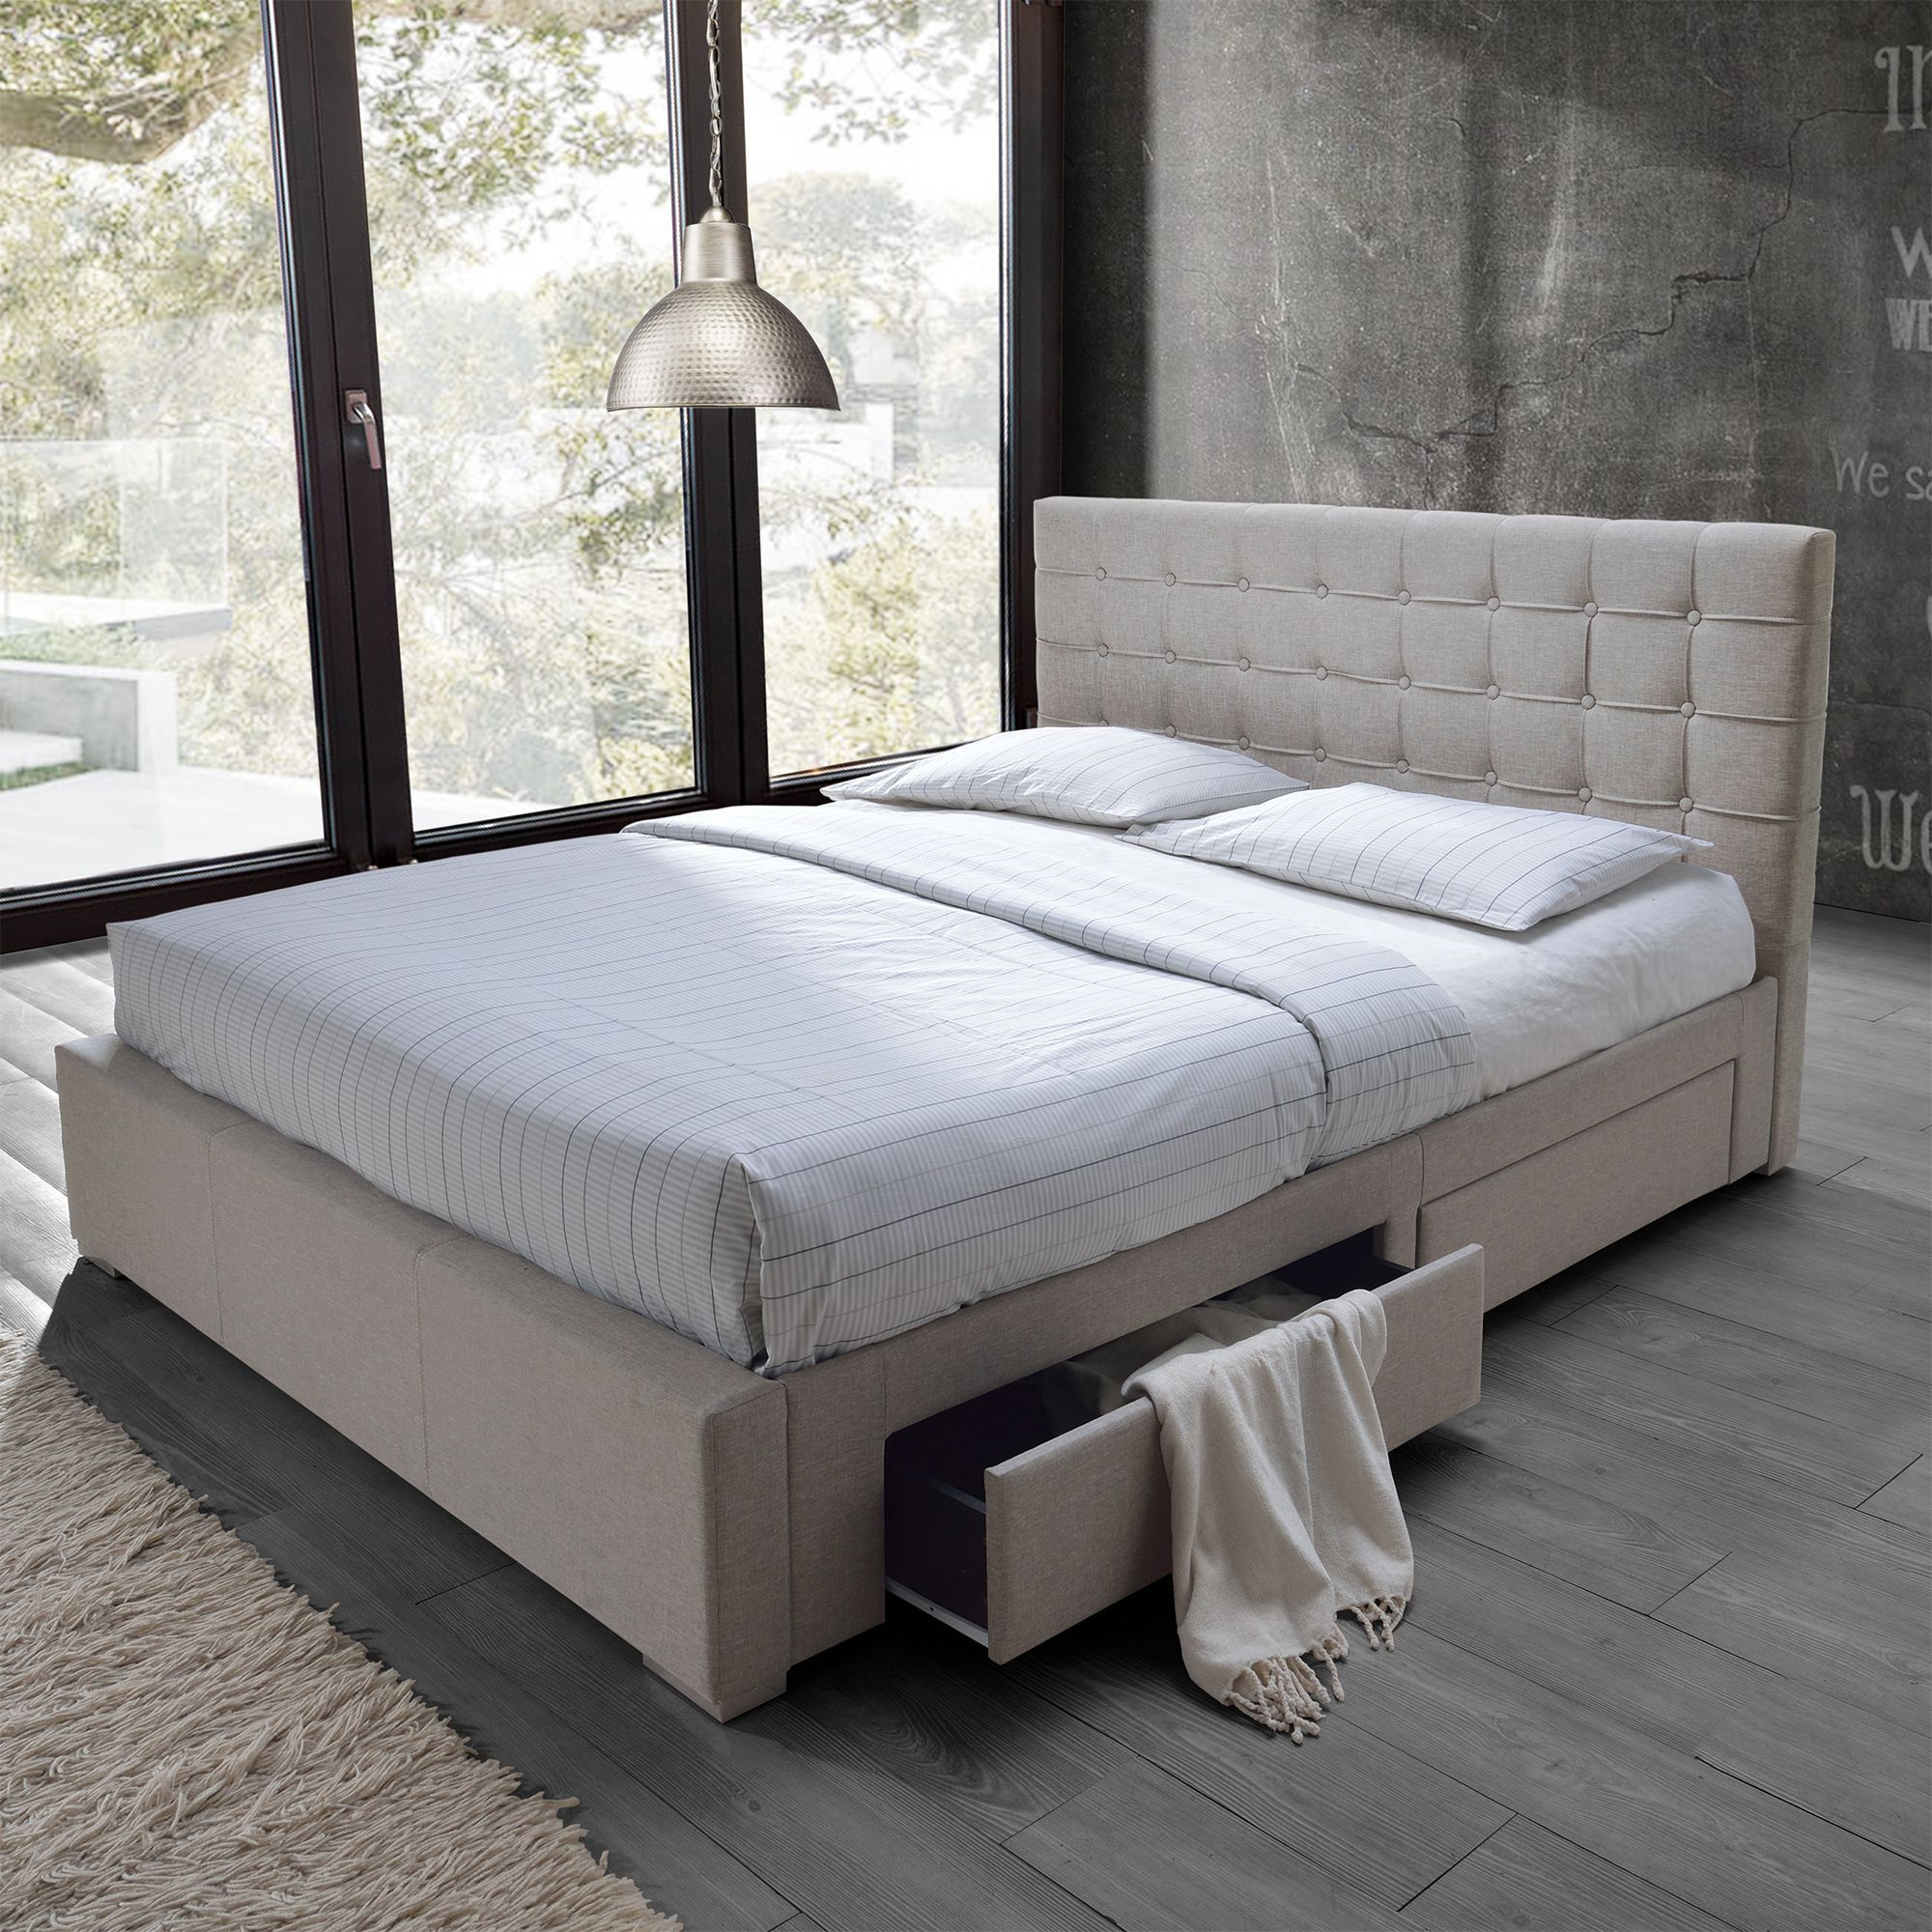 Best Baxton Studio Adonis Modern And Contemporary Beige Fabric 400 x 300